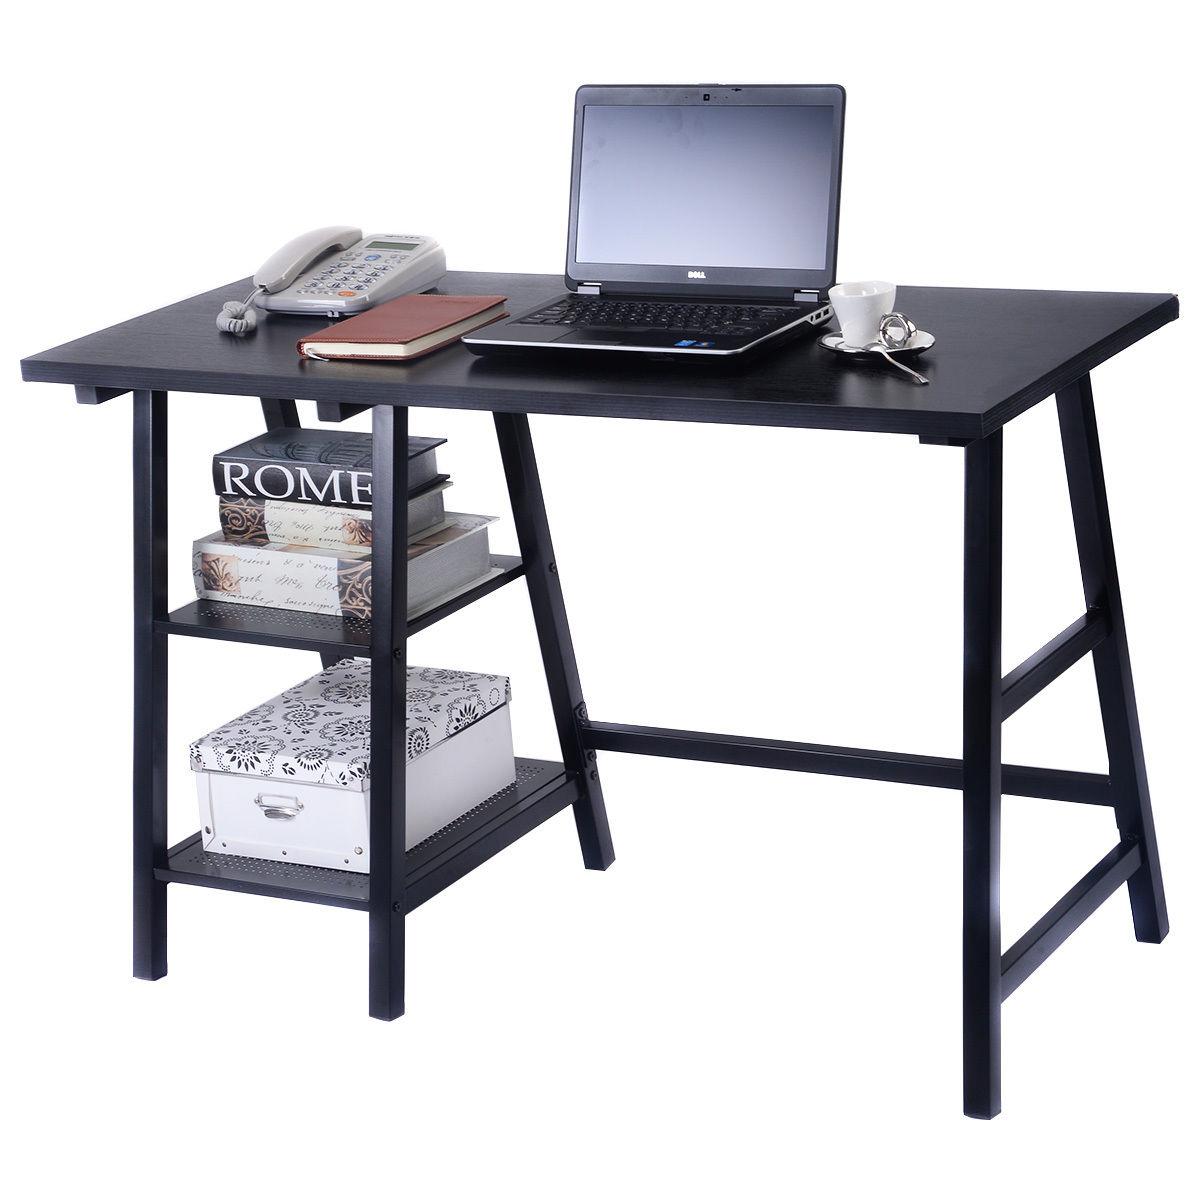 Giantex Modern Trestle Desk Wood Laptop Writing Table With Storage Shelves Home Office Furniture Computer Desk HW51778BK